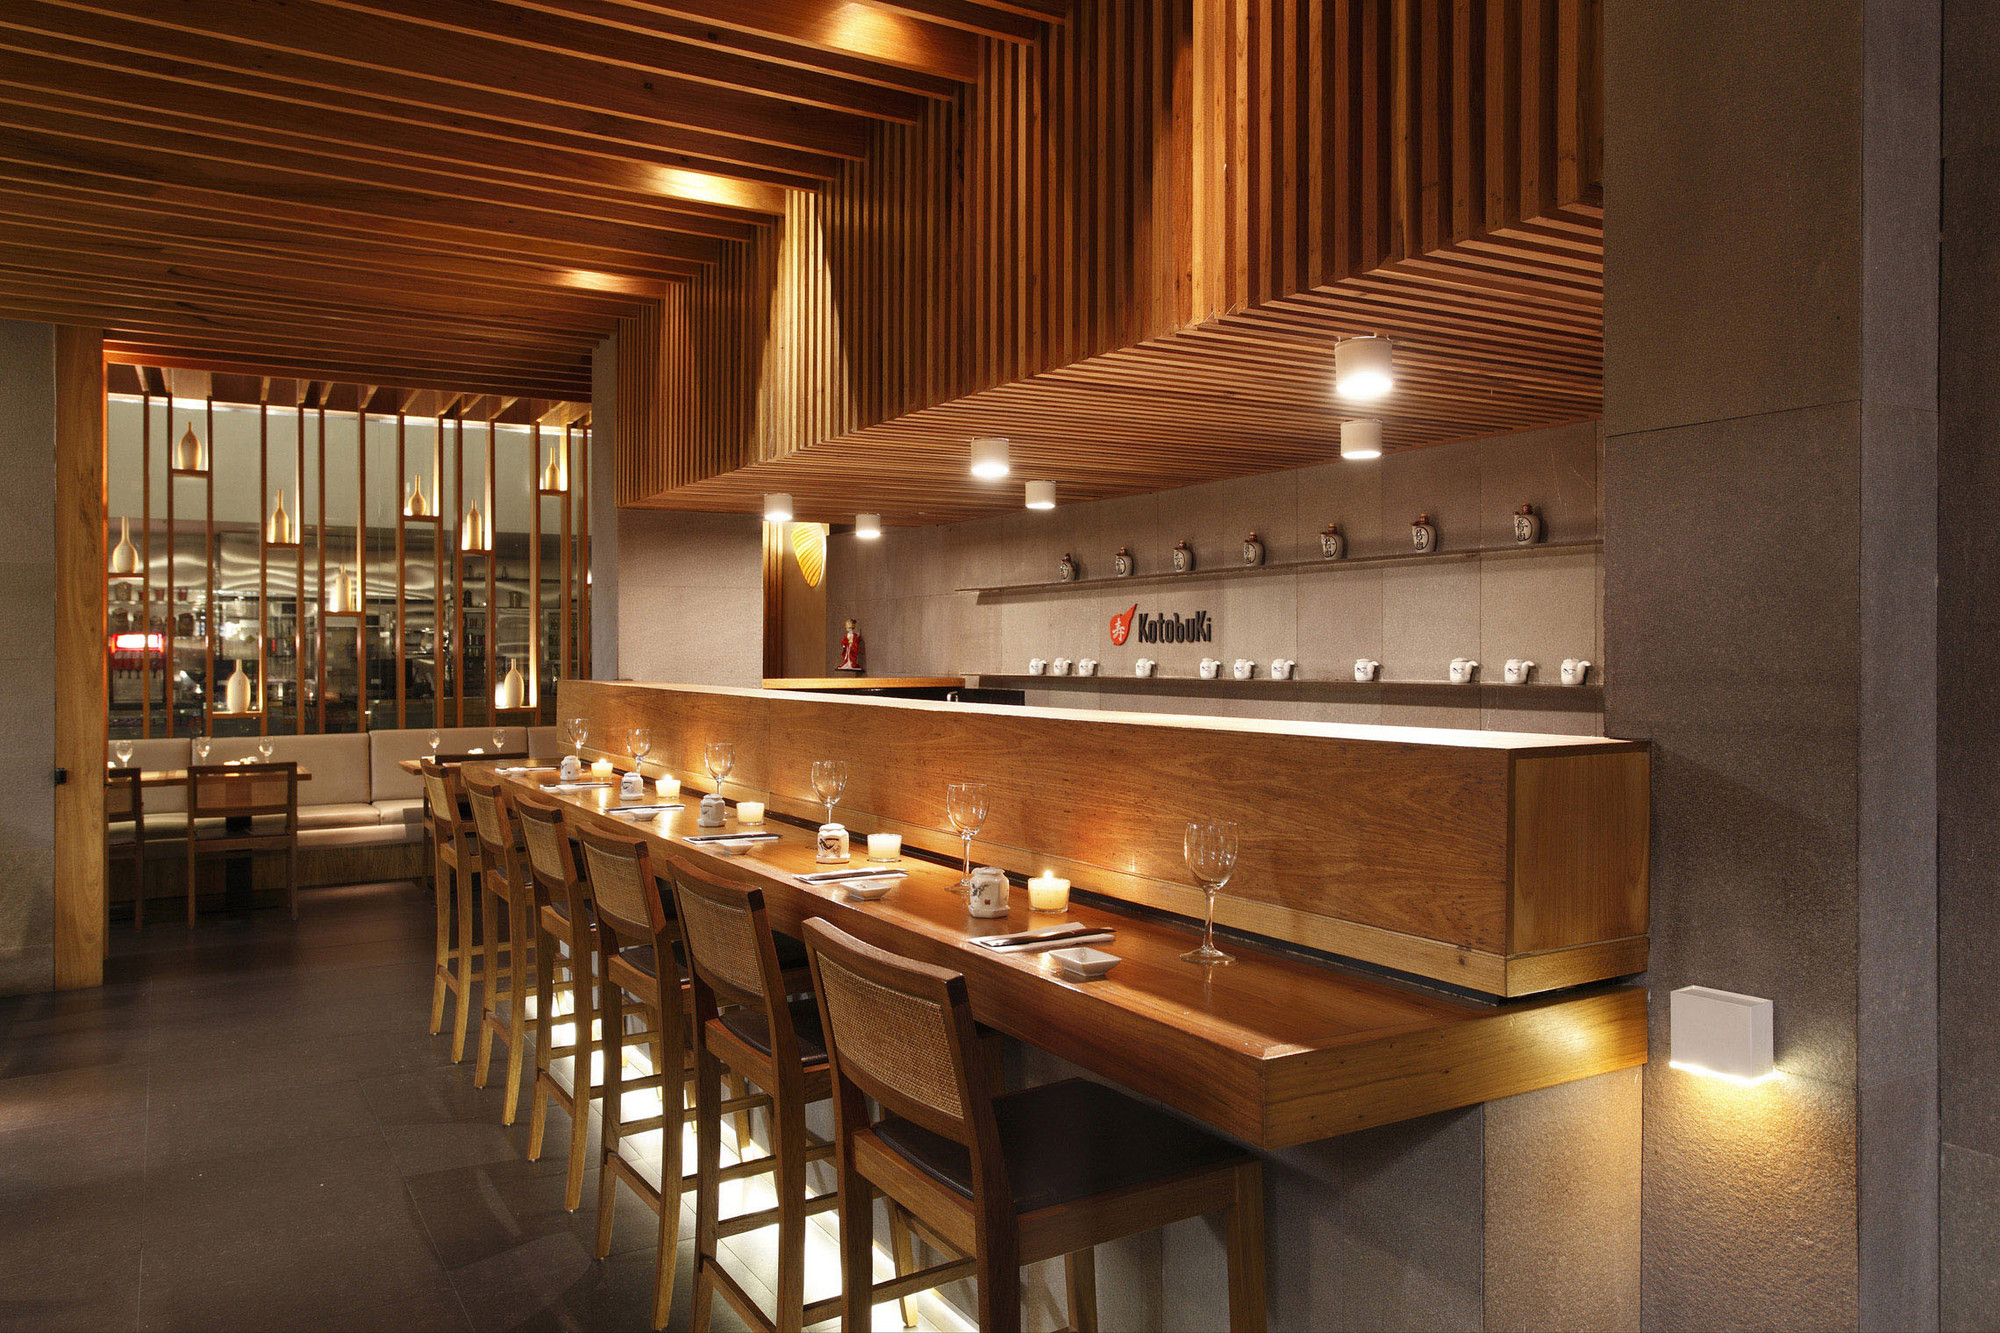 Restaurante kotobuki ivan rezende arquitetura for Restaurante arquitectura